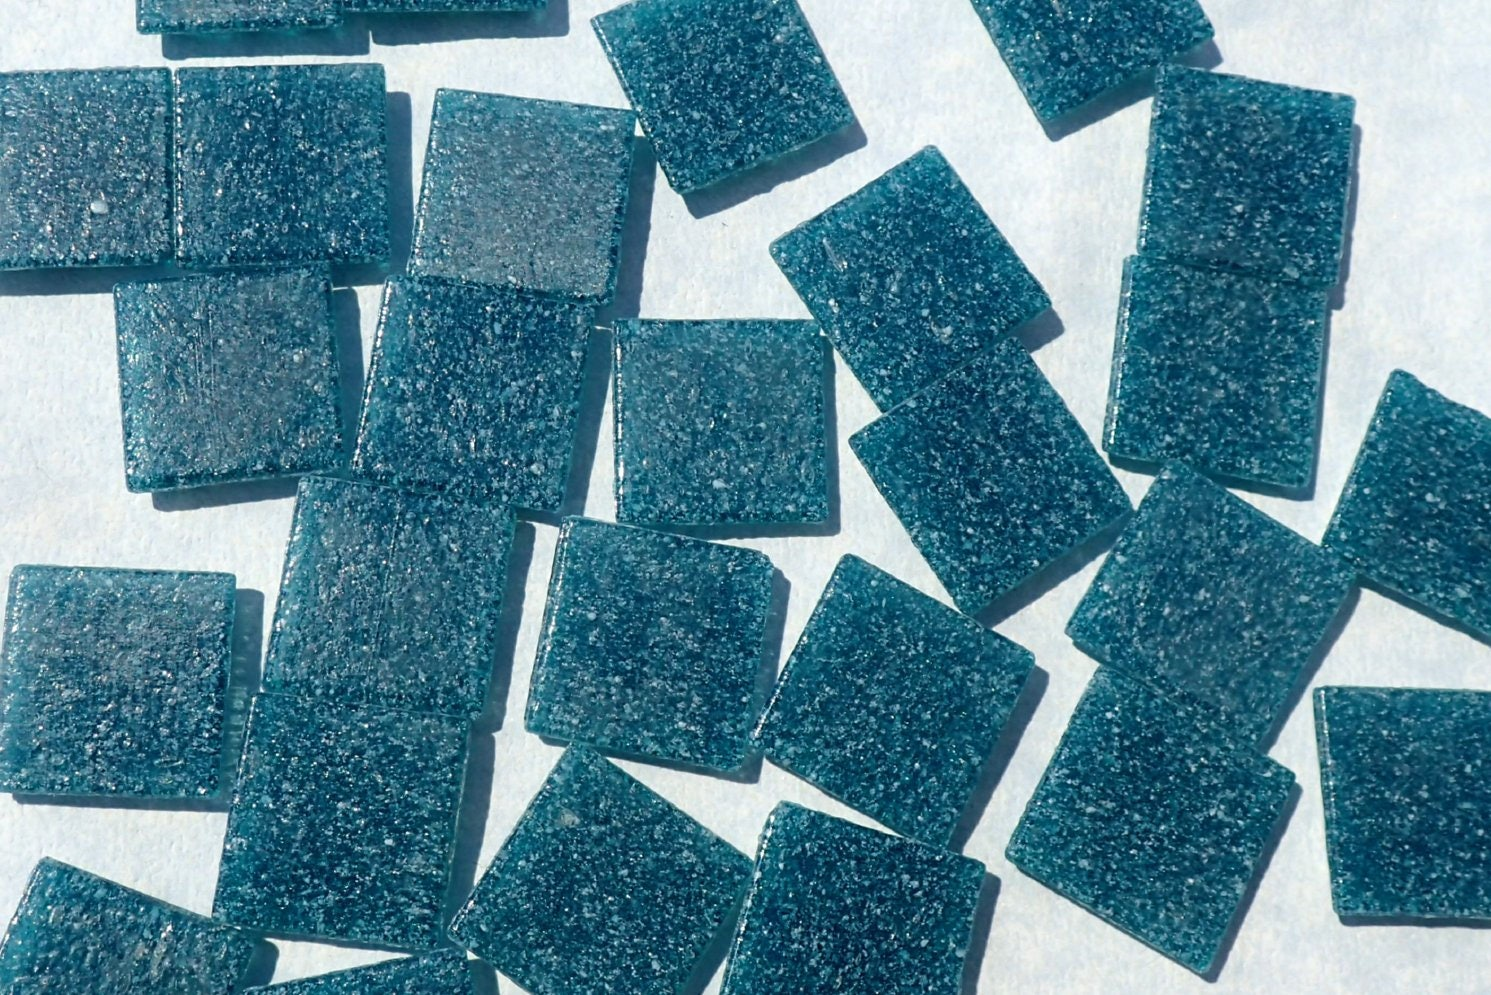 Dark Teal Glass Mosaic Tiles Squares - 3/4 - Half Pound of Deep ...